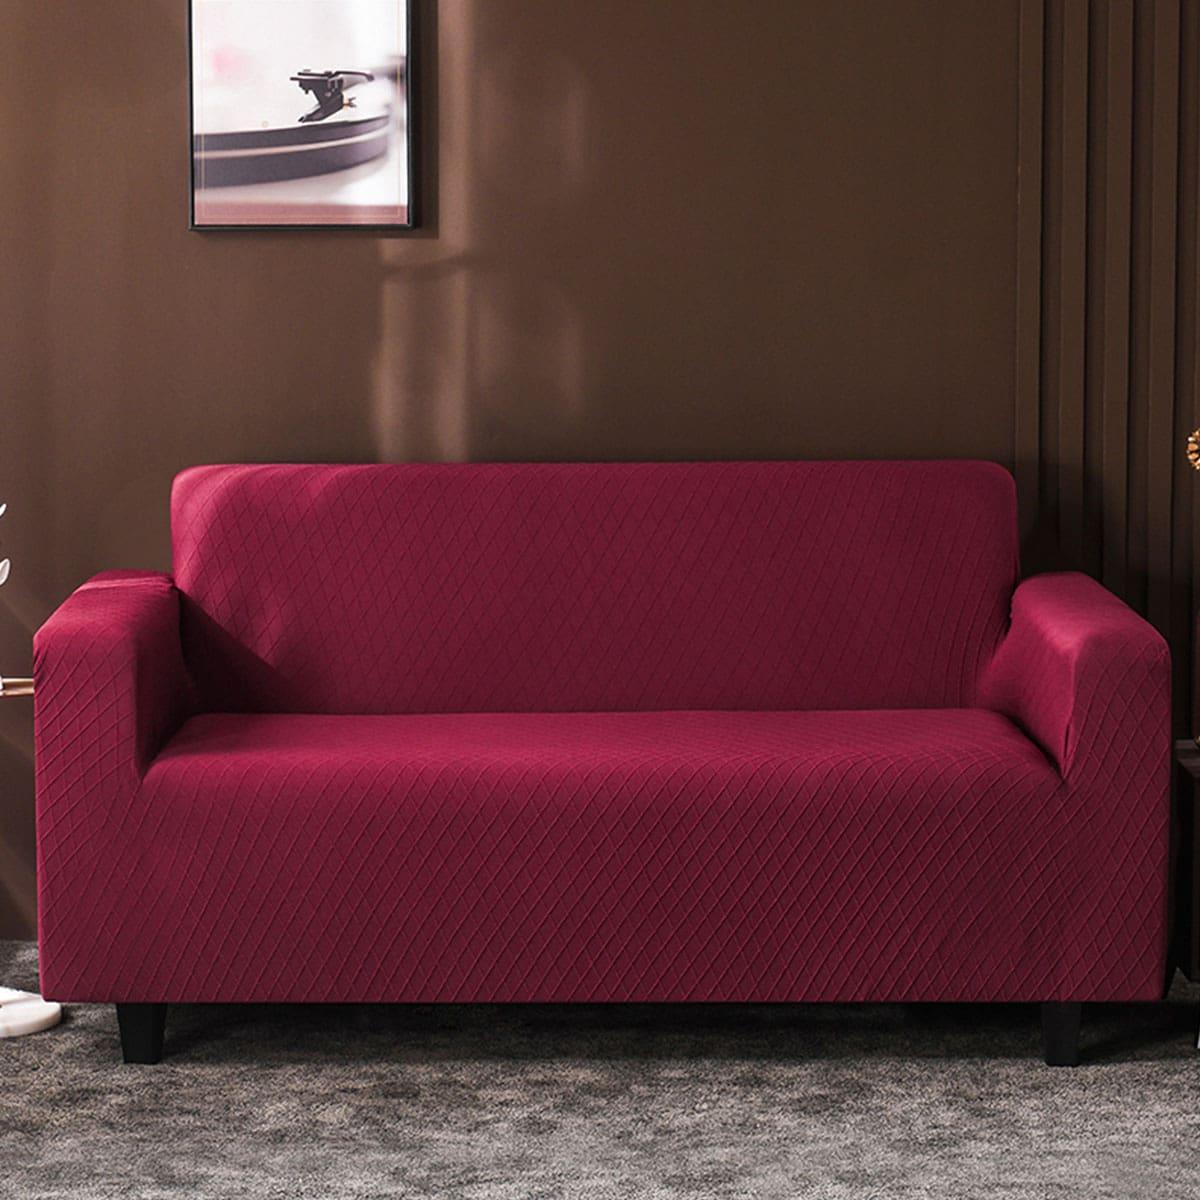 Однотонный эластичный чехол для диван без подушки